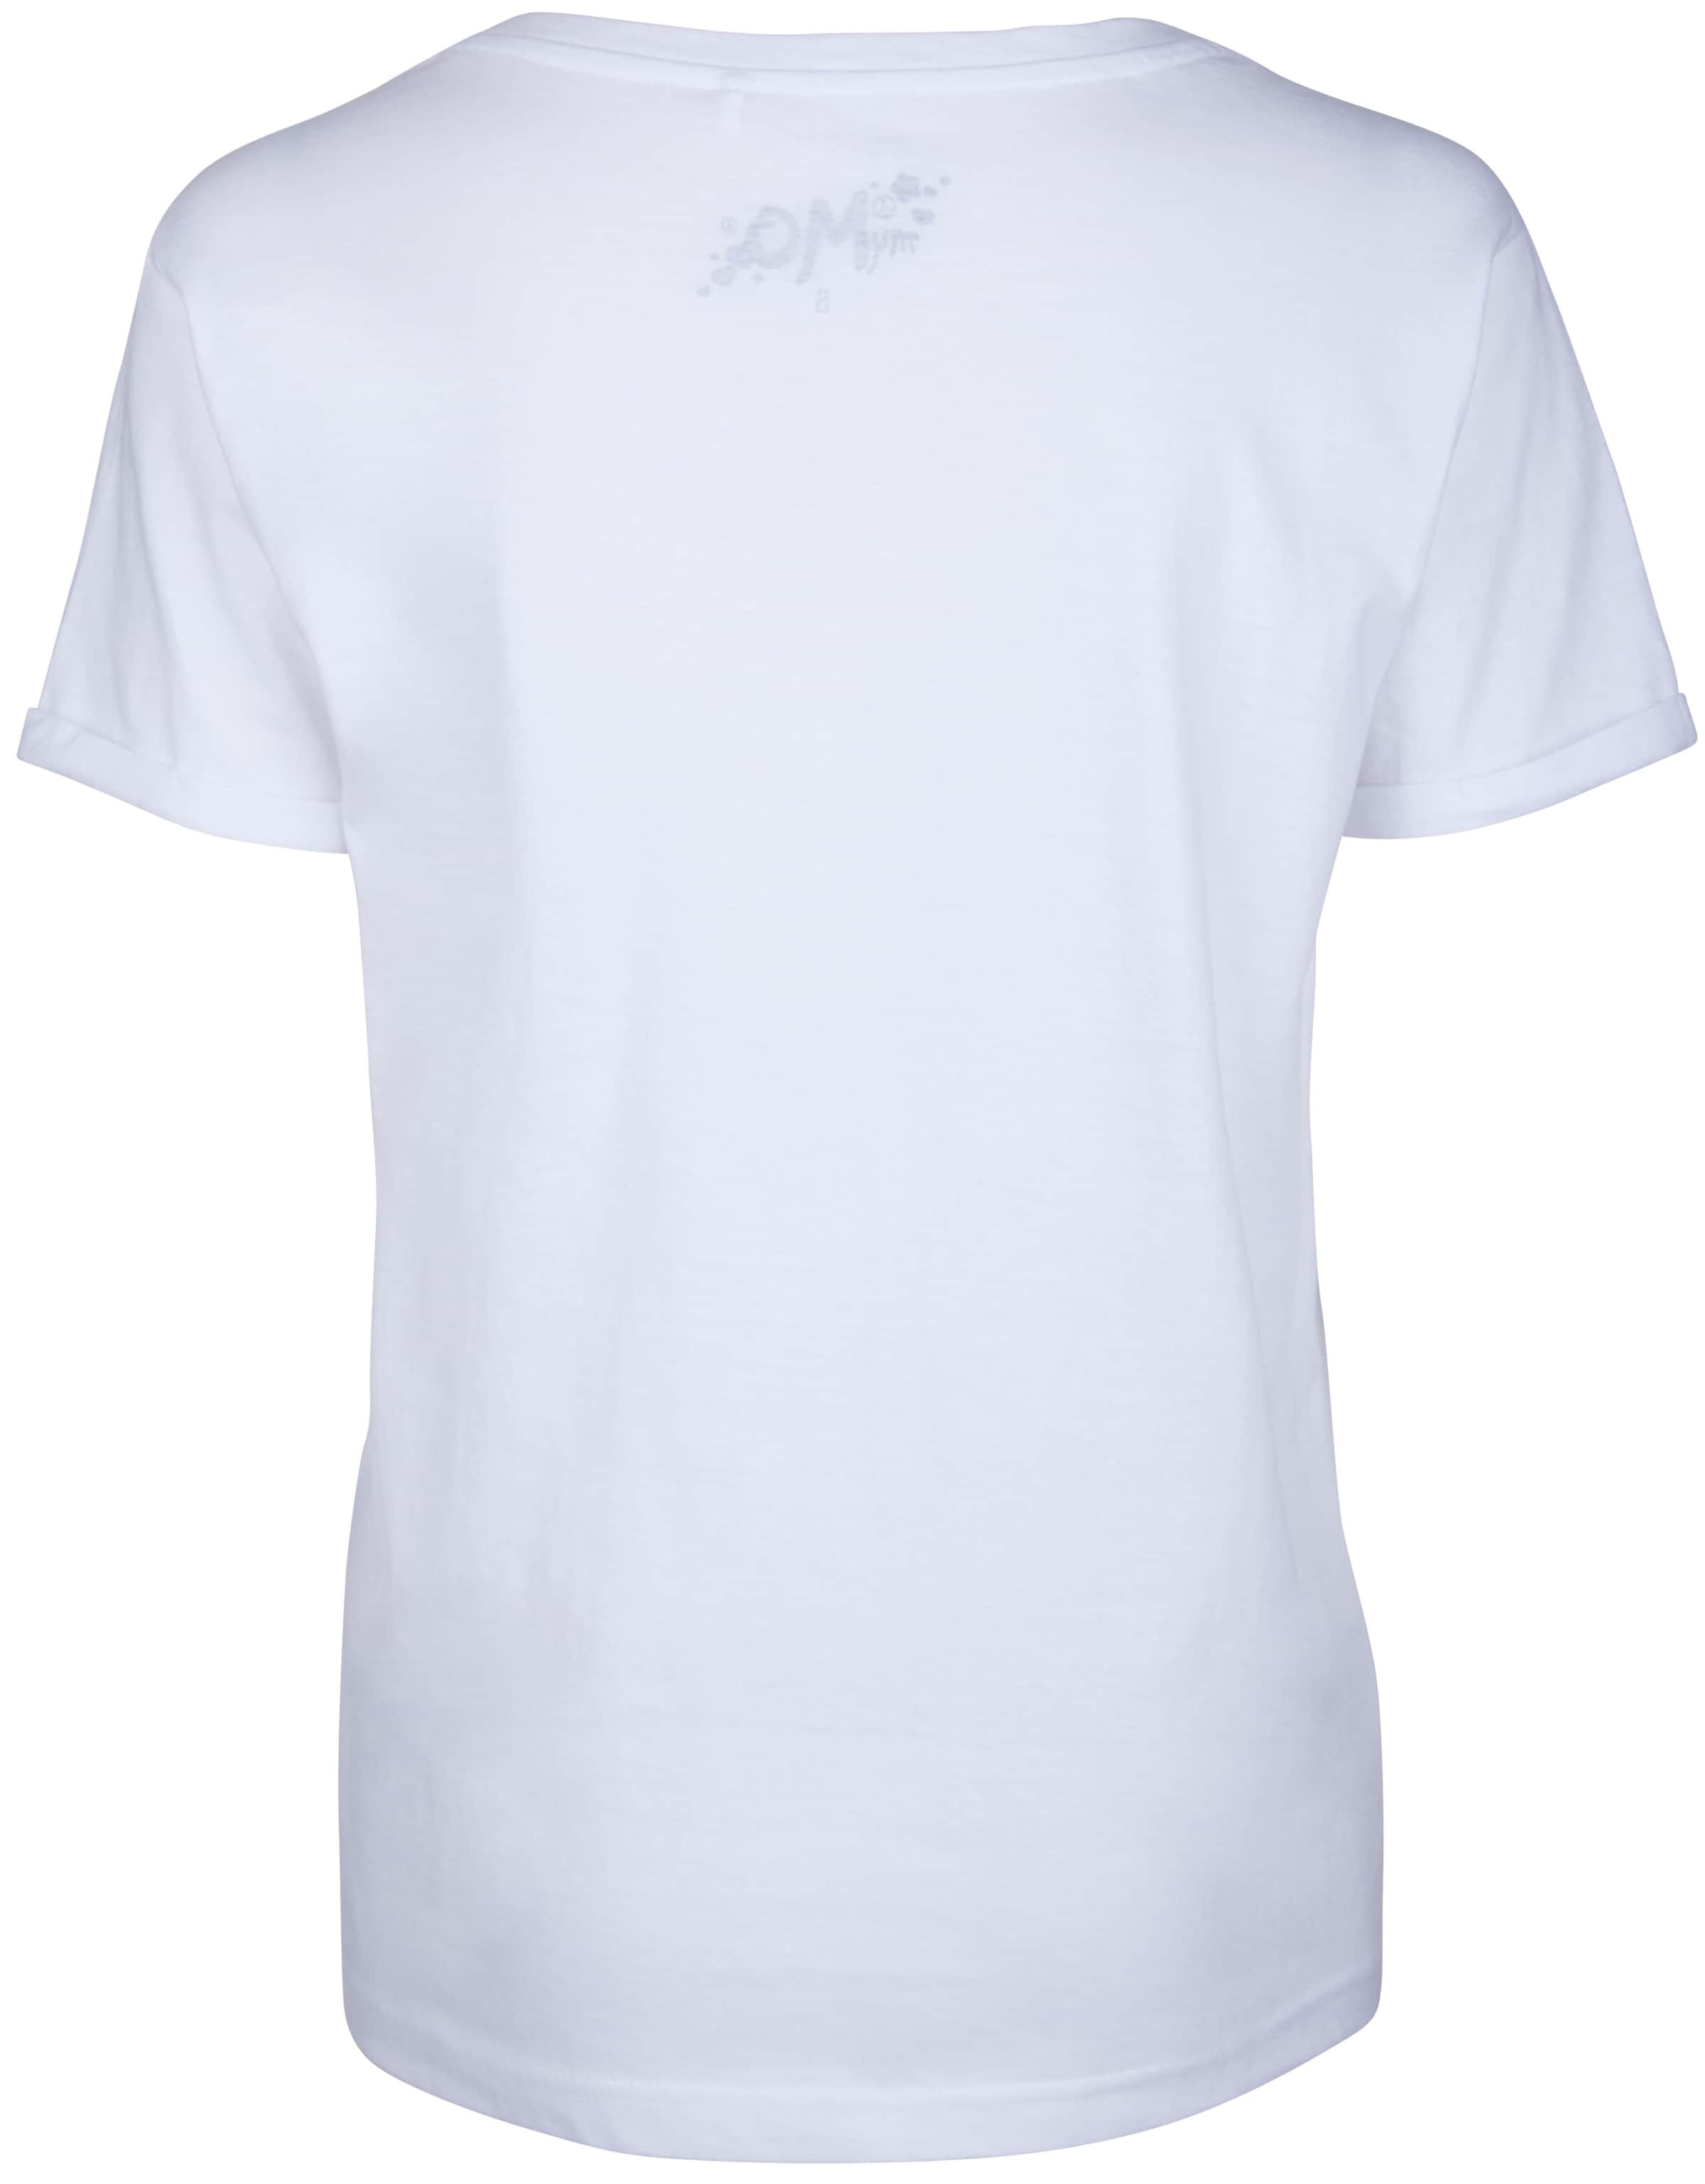 T T Noir Mymo En Mymo shirt shirt b6Yfg7y